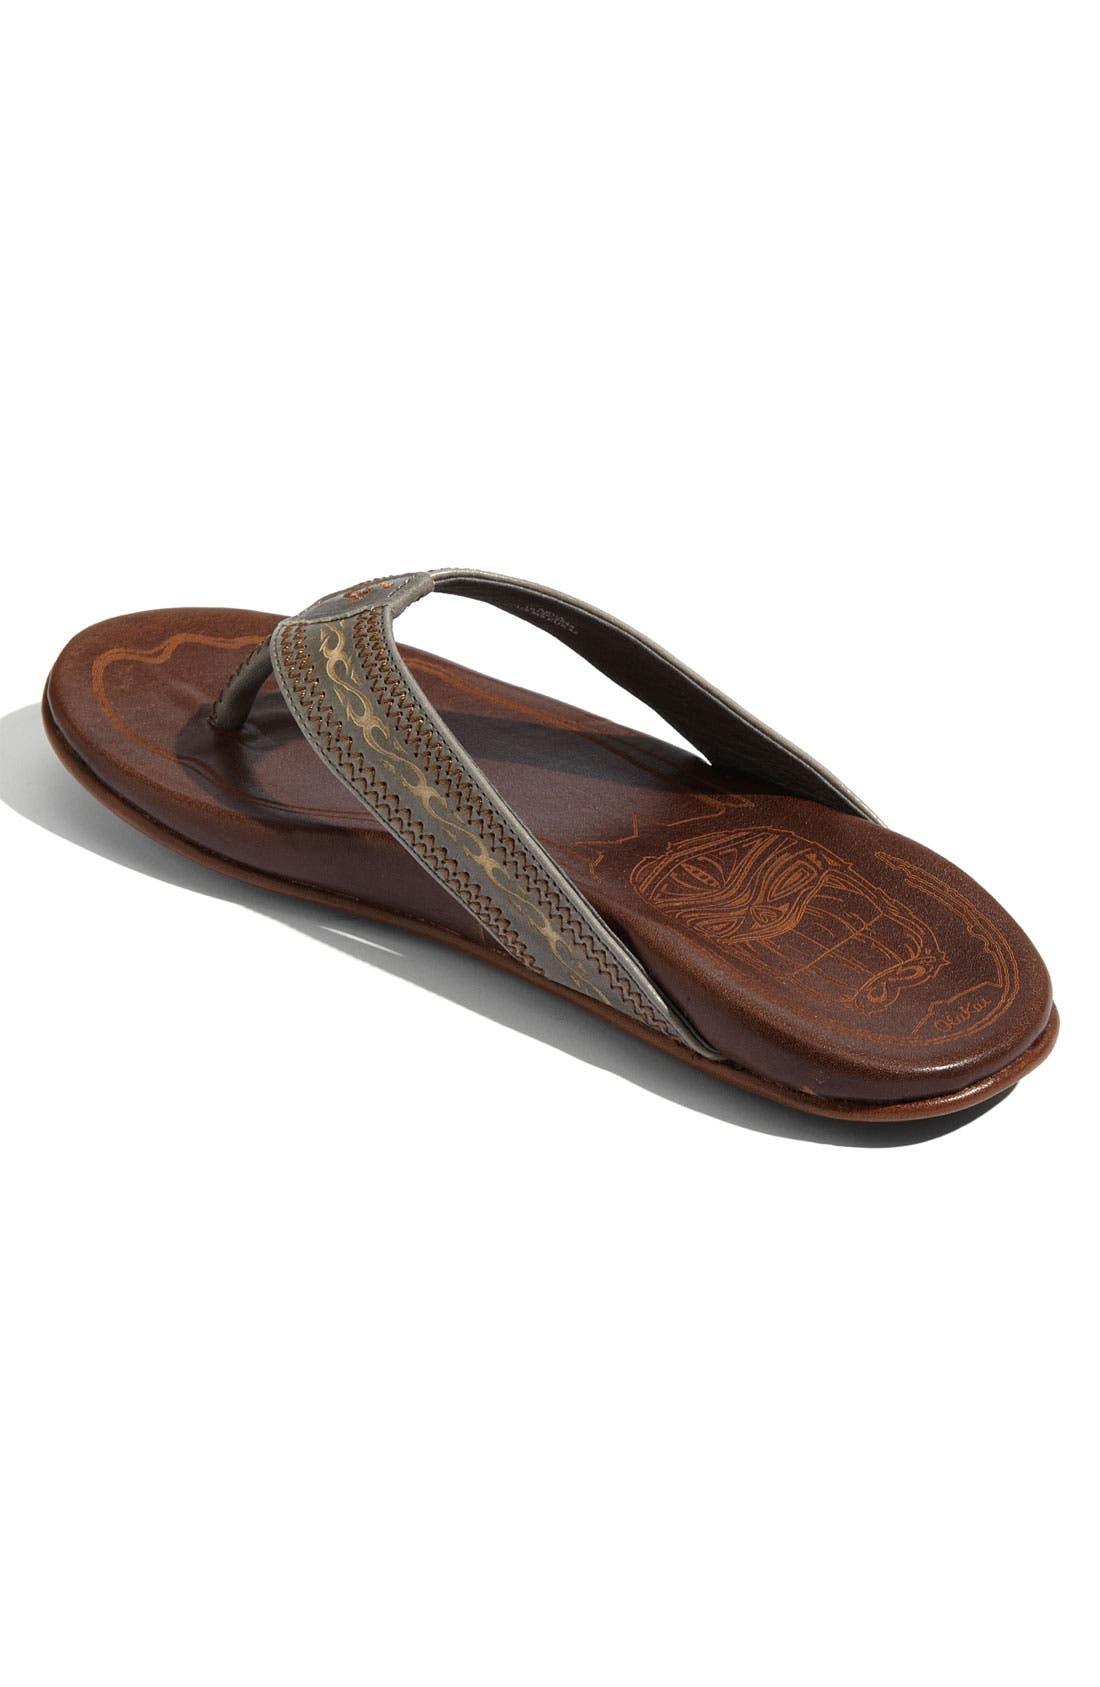 Alternate Image 2  - OluKai 'Akua' Flip Flop (Nordstrom Exclusive) (Men)